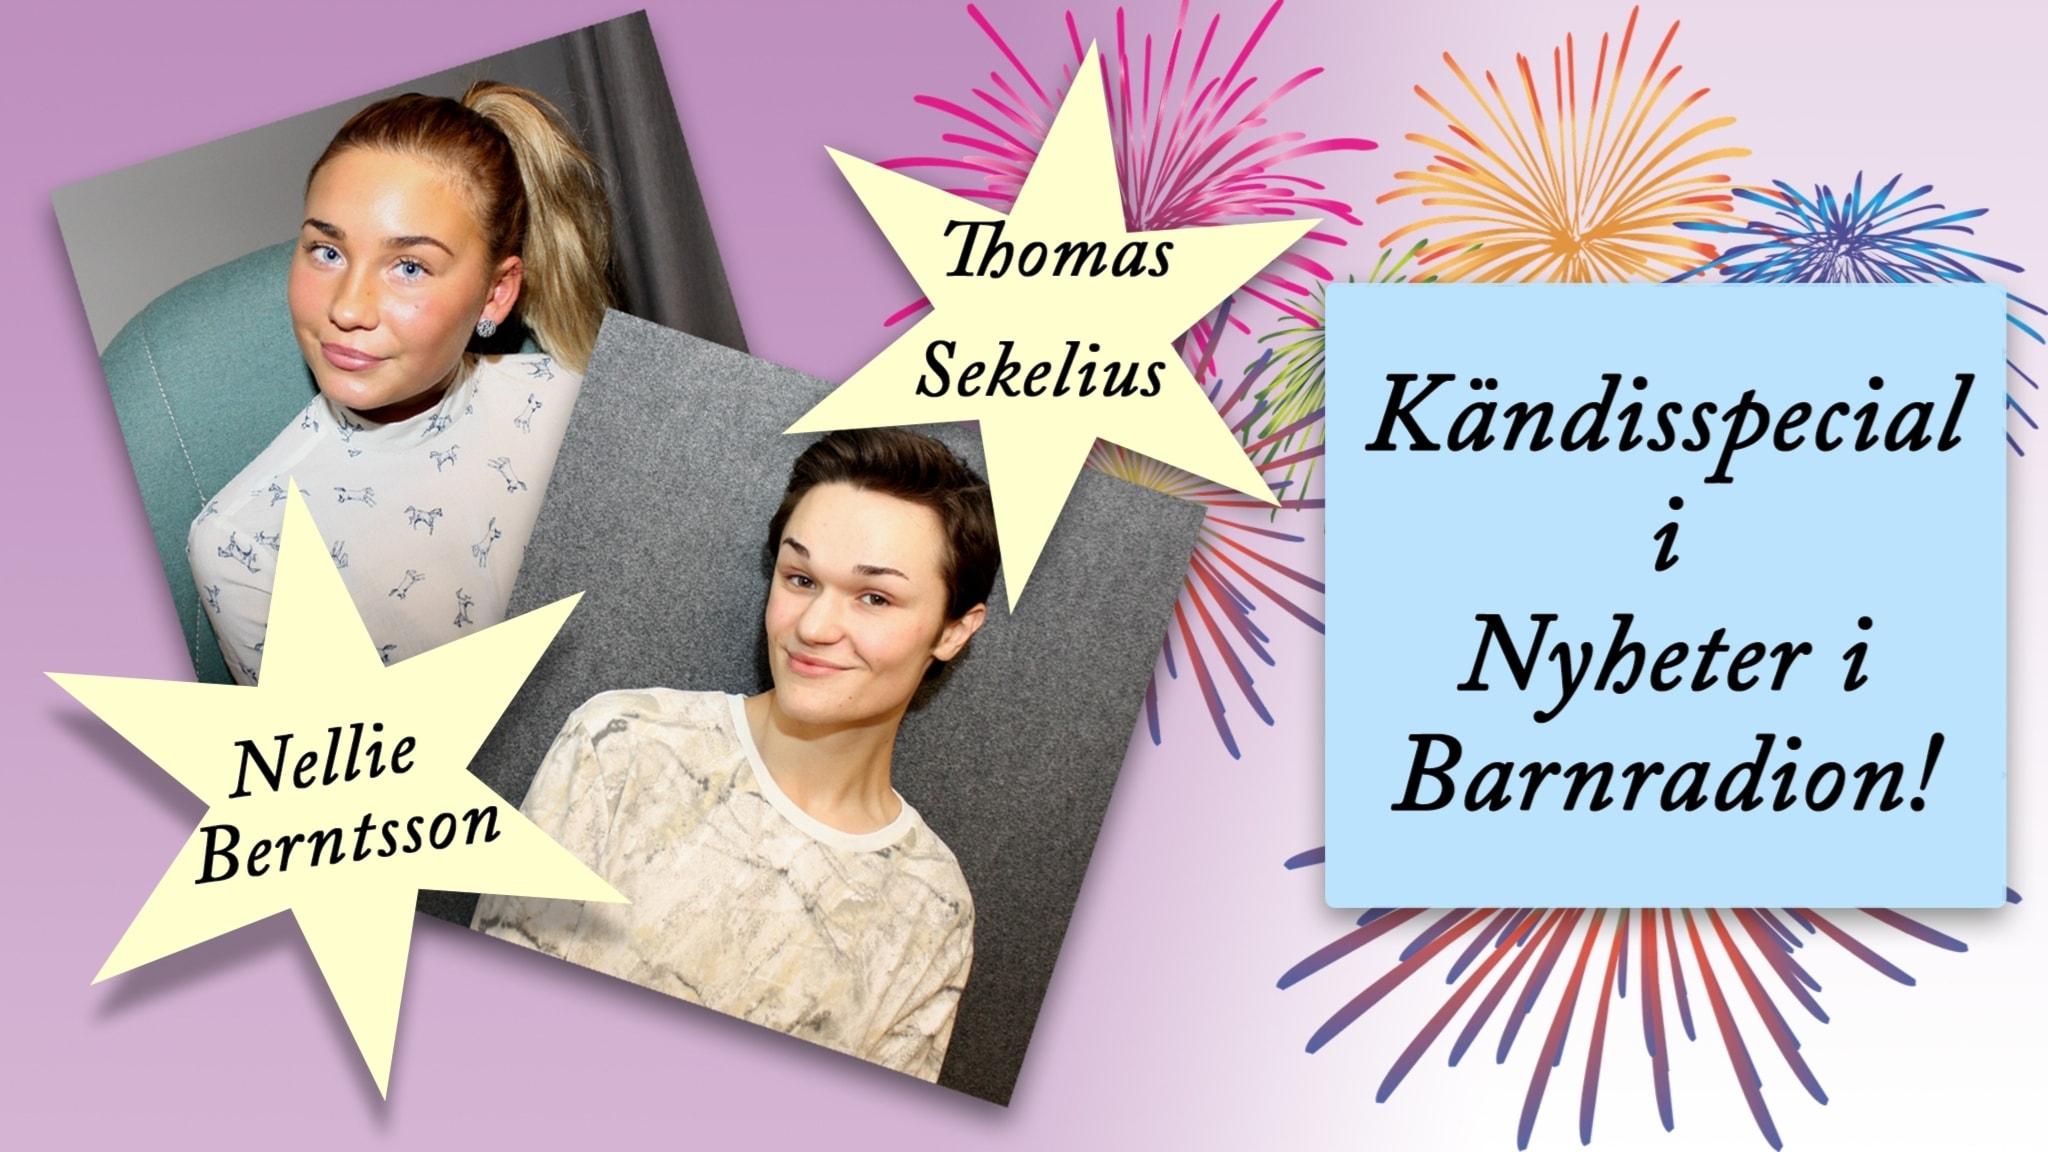 Kändisspecial med Nellie Berntsson och Thomas Sekelius